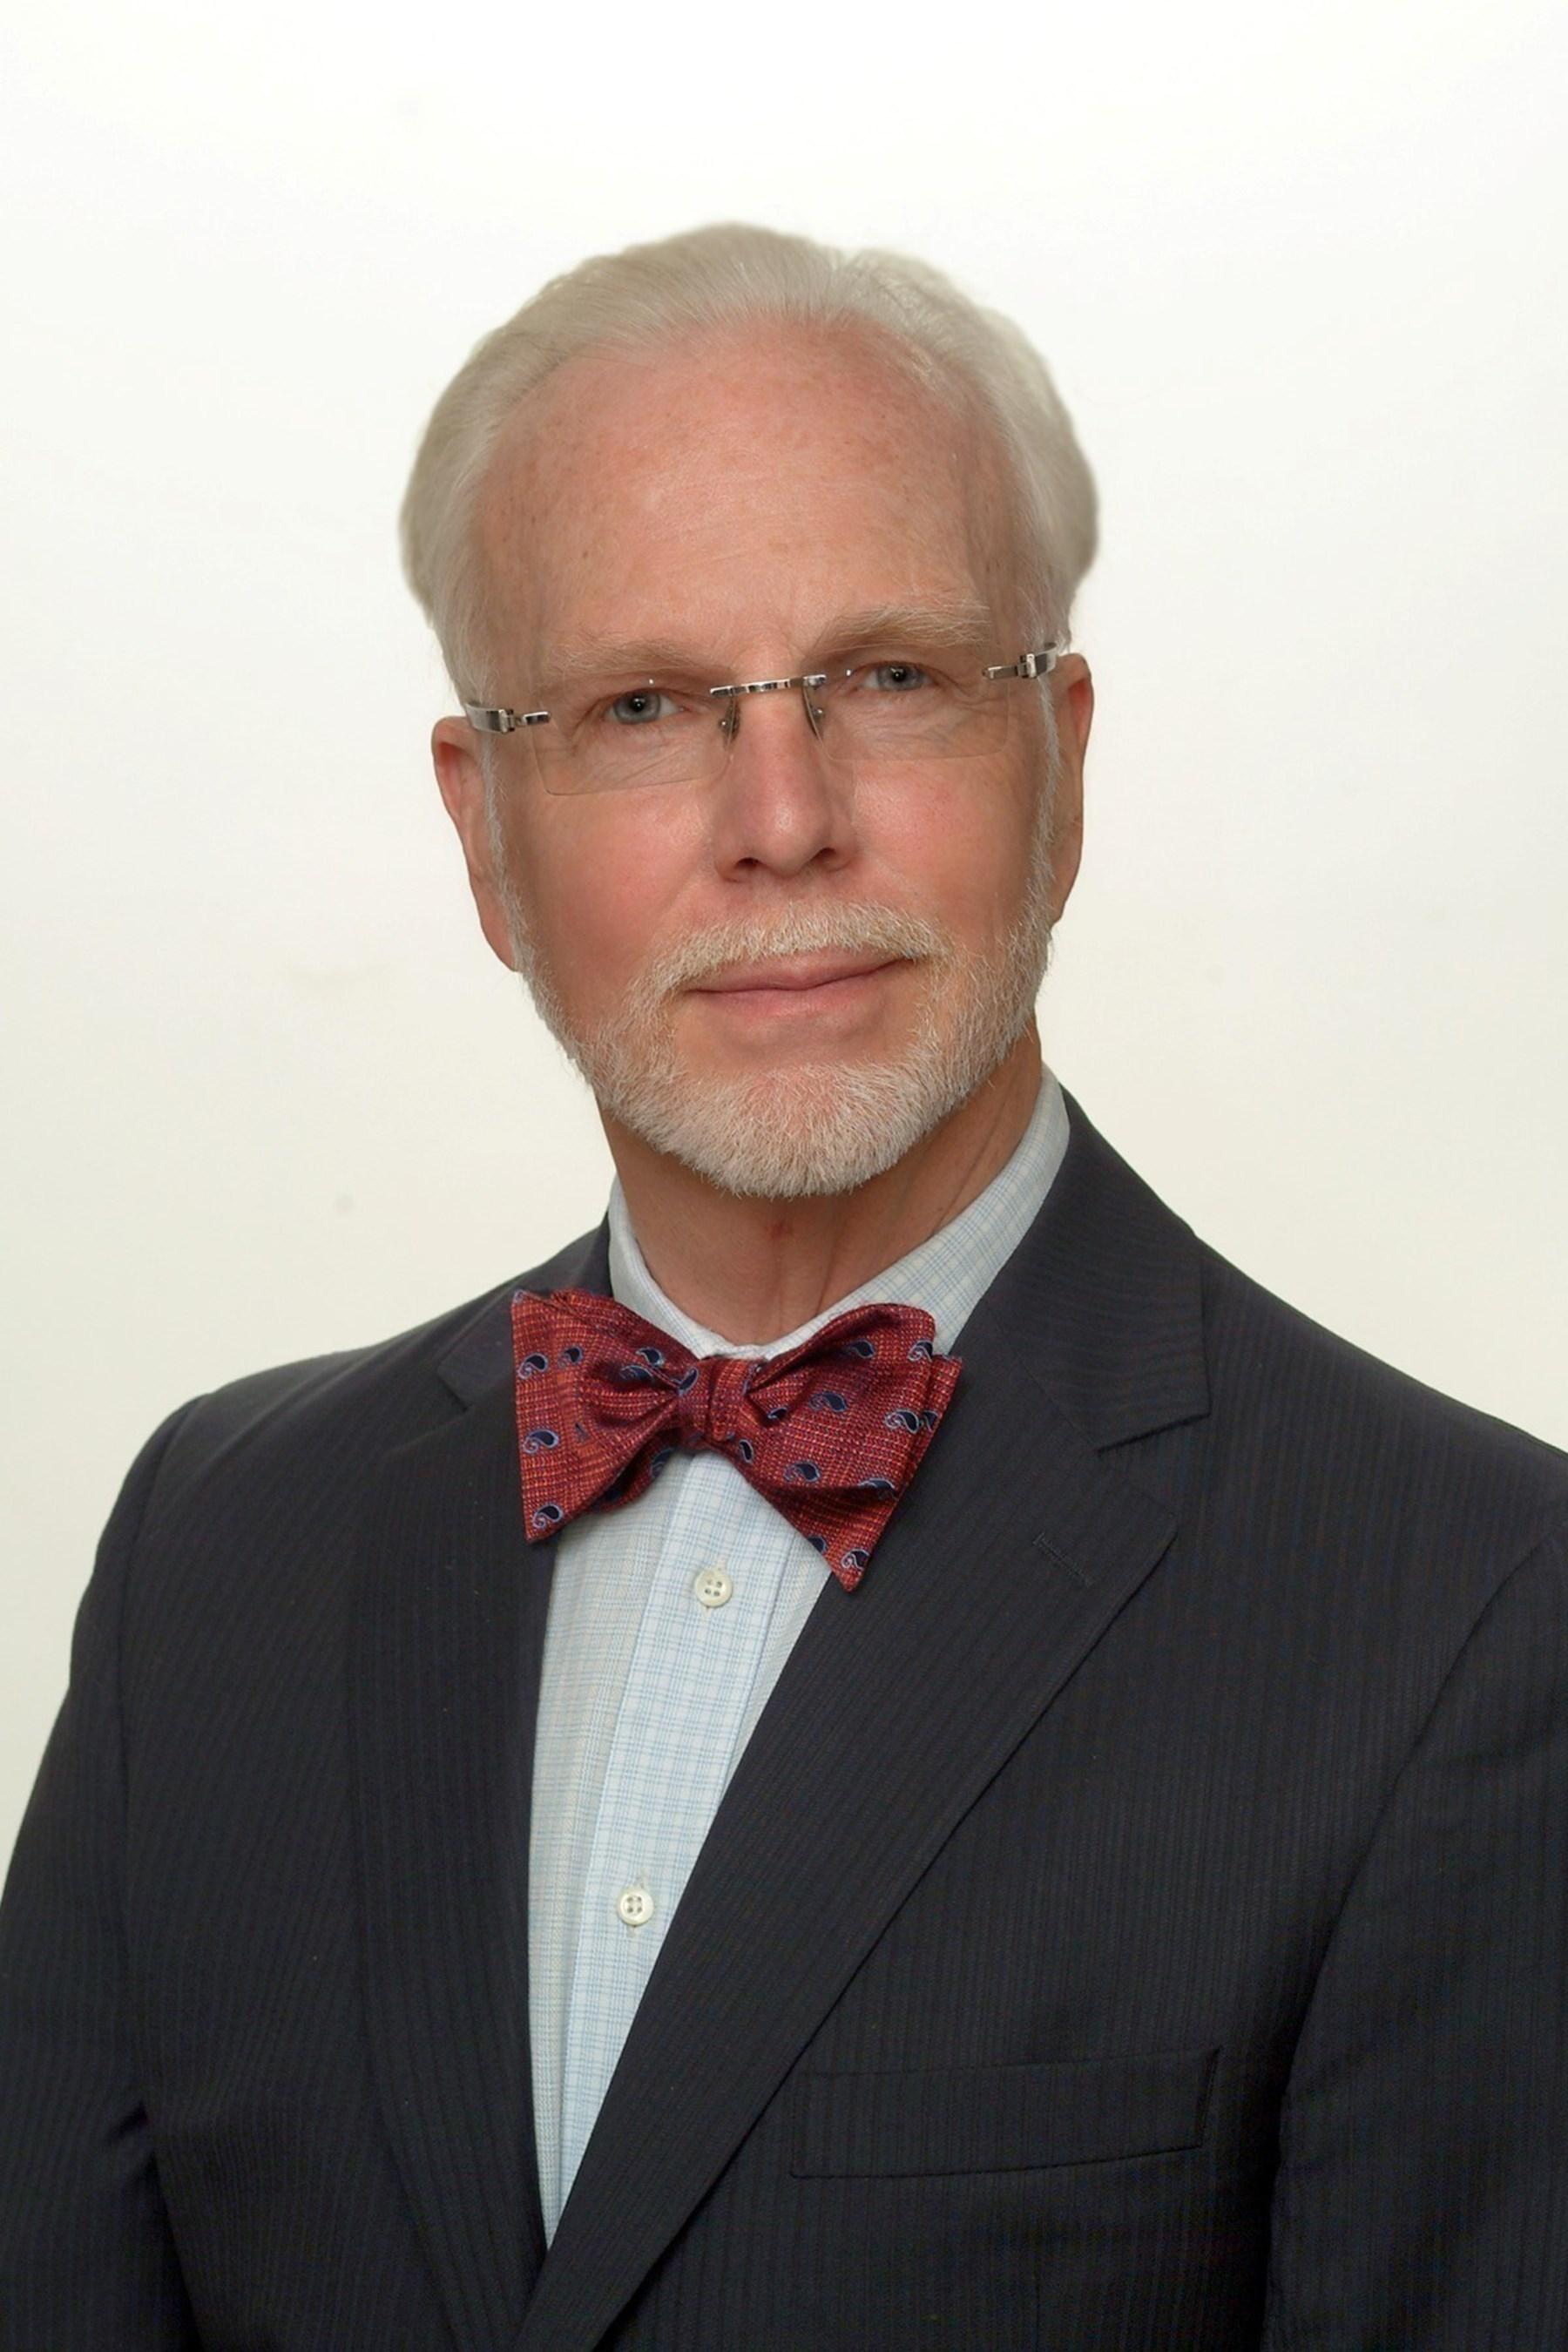 Steve Williamson, President and Chairman, T.D. Williamson